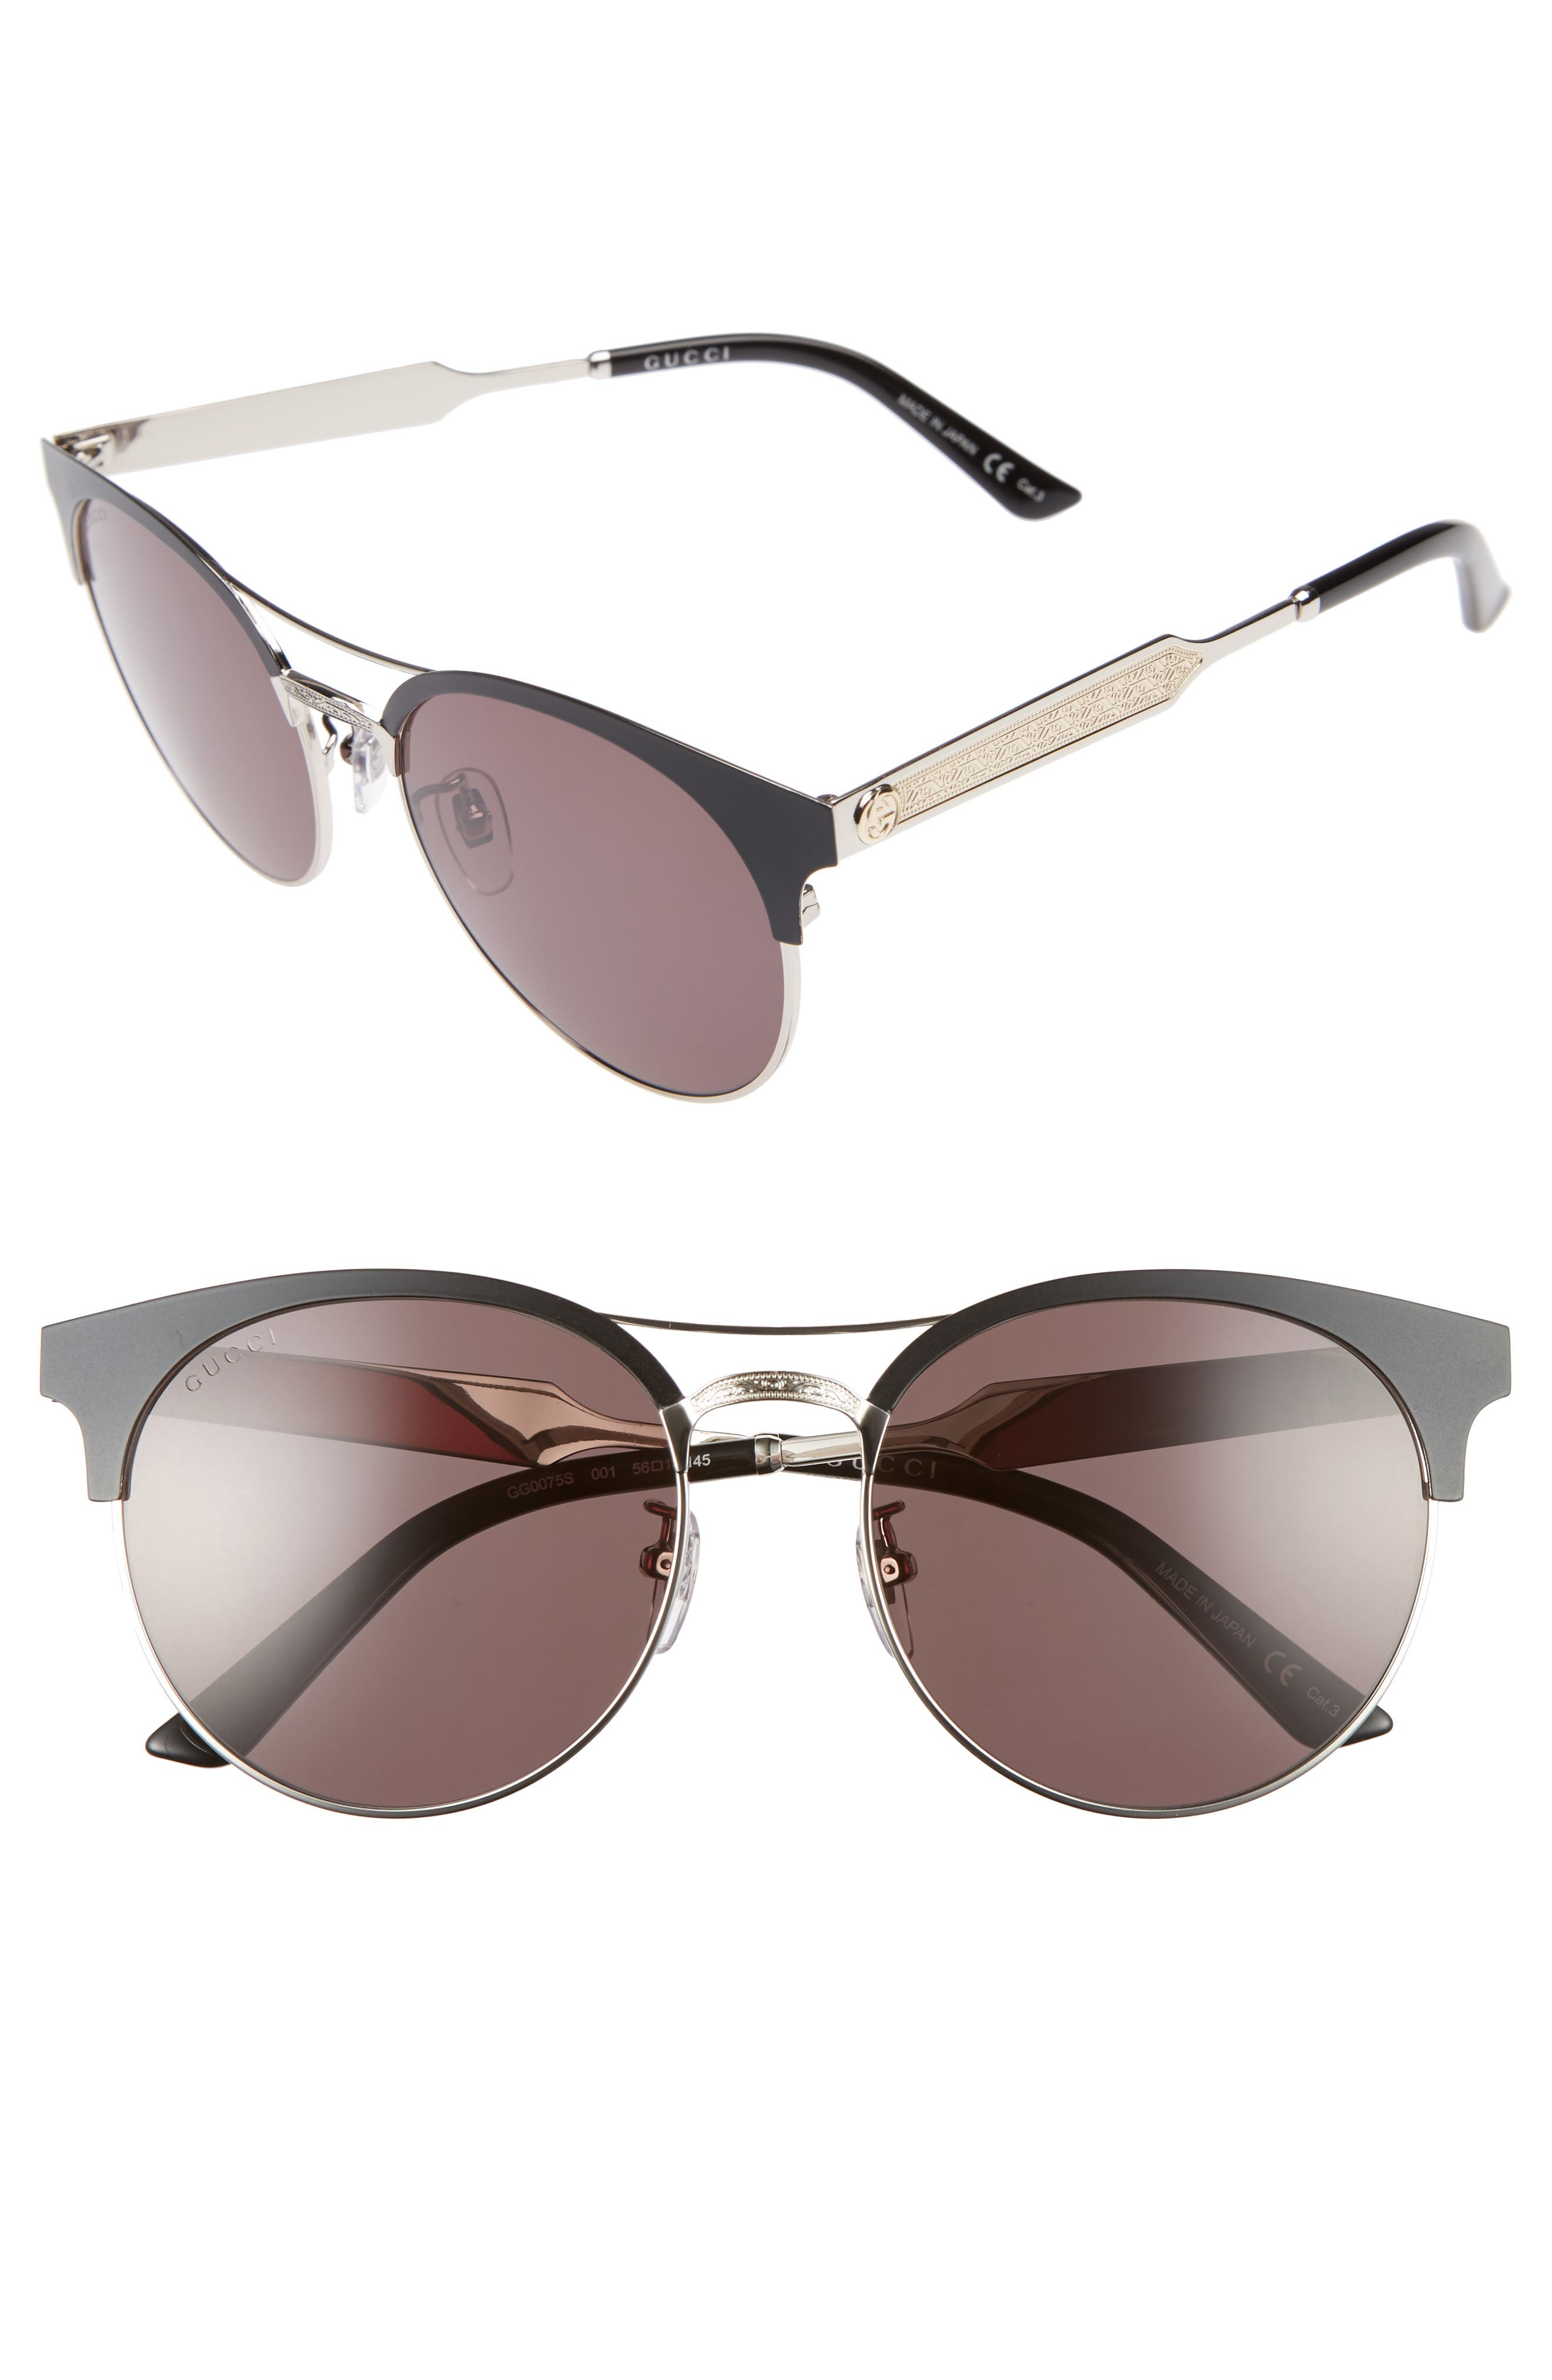 56mm Retro Sunglasses,                             Main thumbnail 1, color,